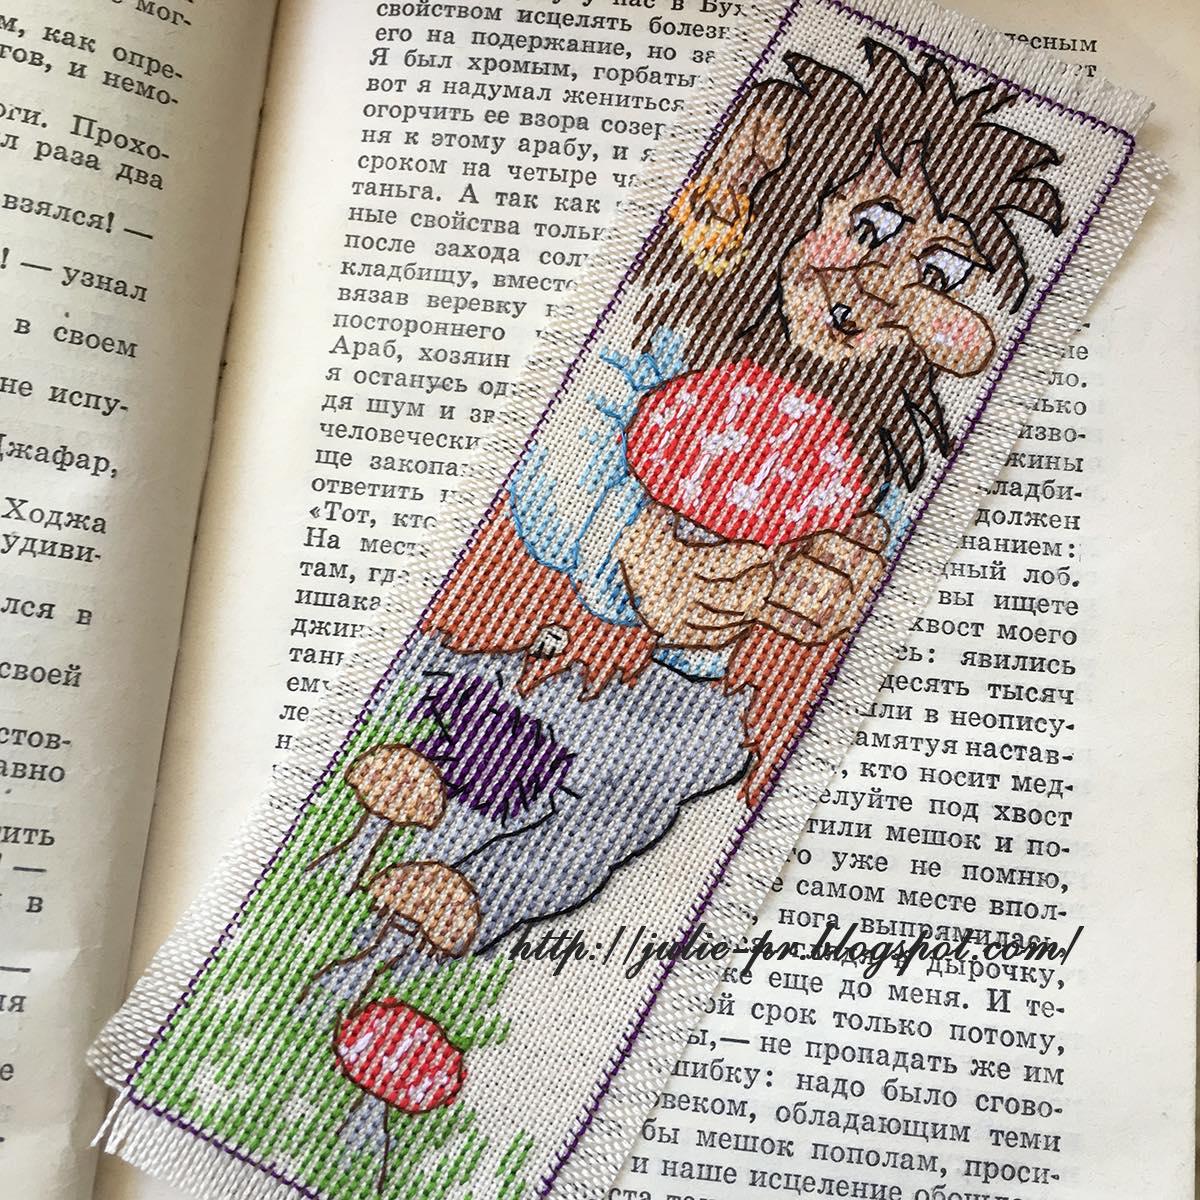 Вышивка крестом, закладка, тролль, Норвегия, Permin 05-5562 Troll bookmark, пермин, закладка с троллем